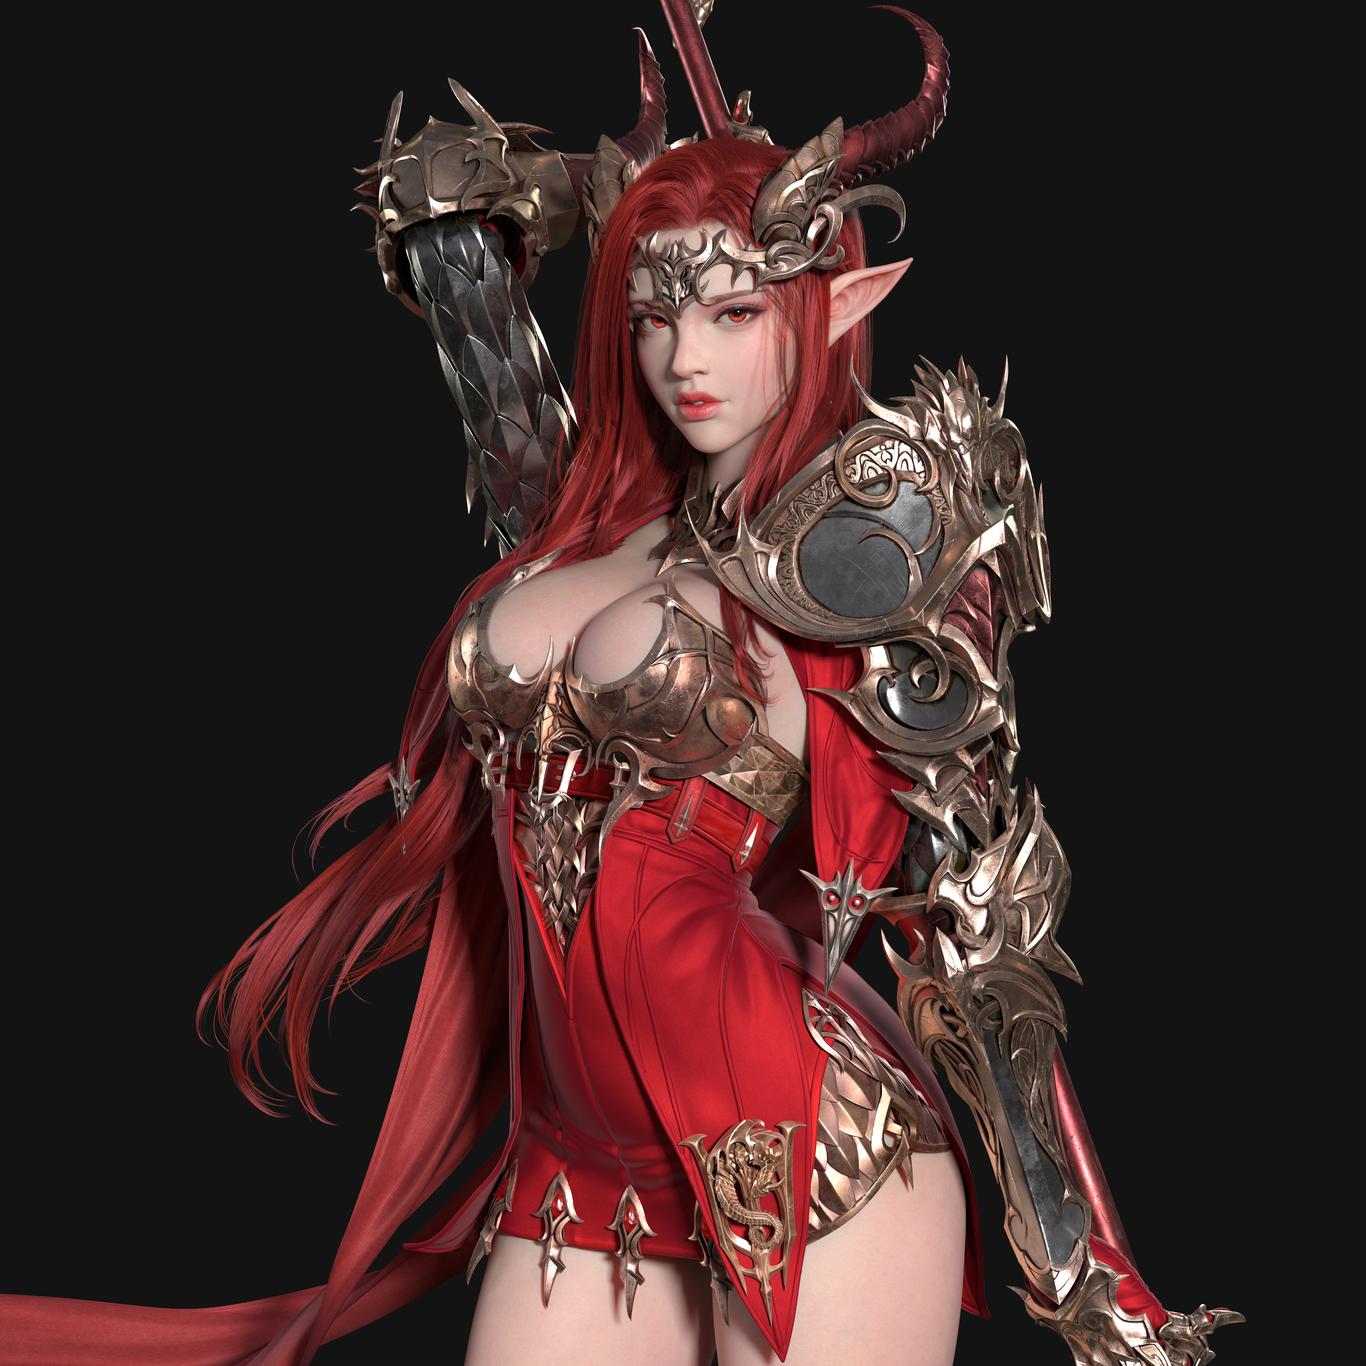 Xie hai hua goddess of dragon lo 1 8aacde10 2rq7